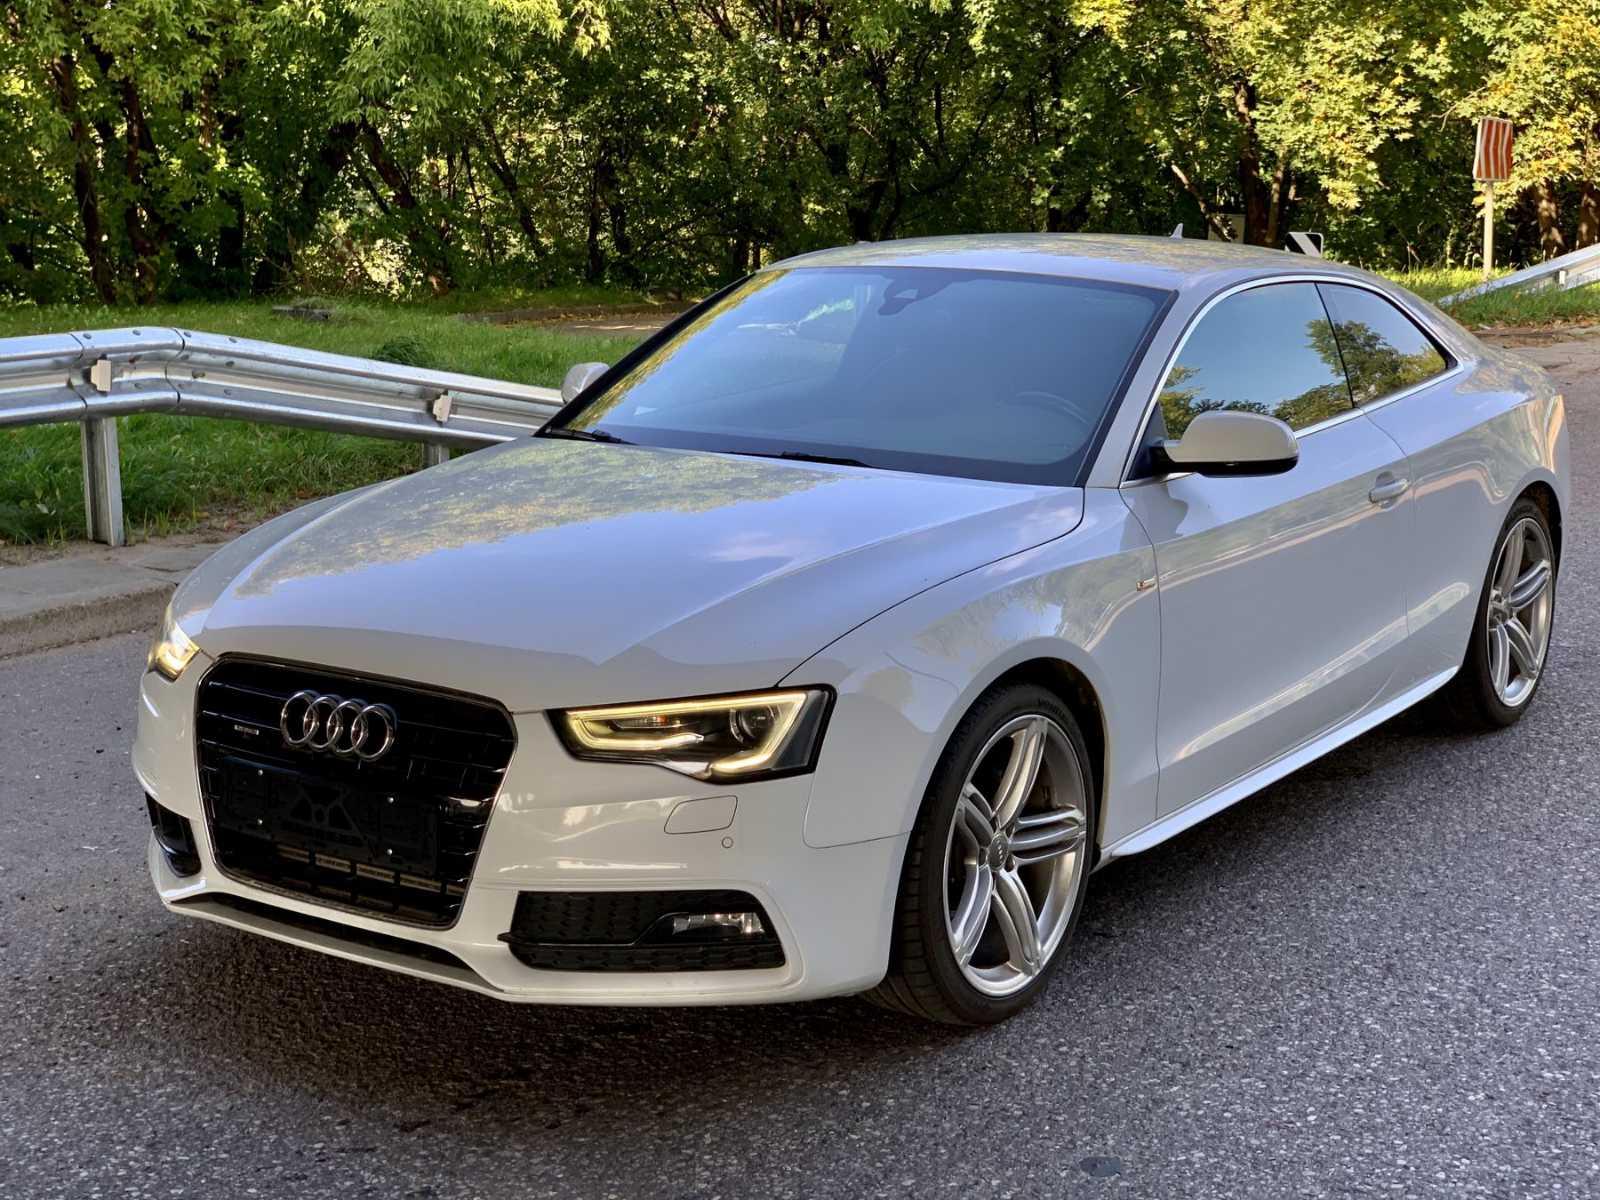 Audi A5, 2.0 l., kupė (coupe)